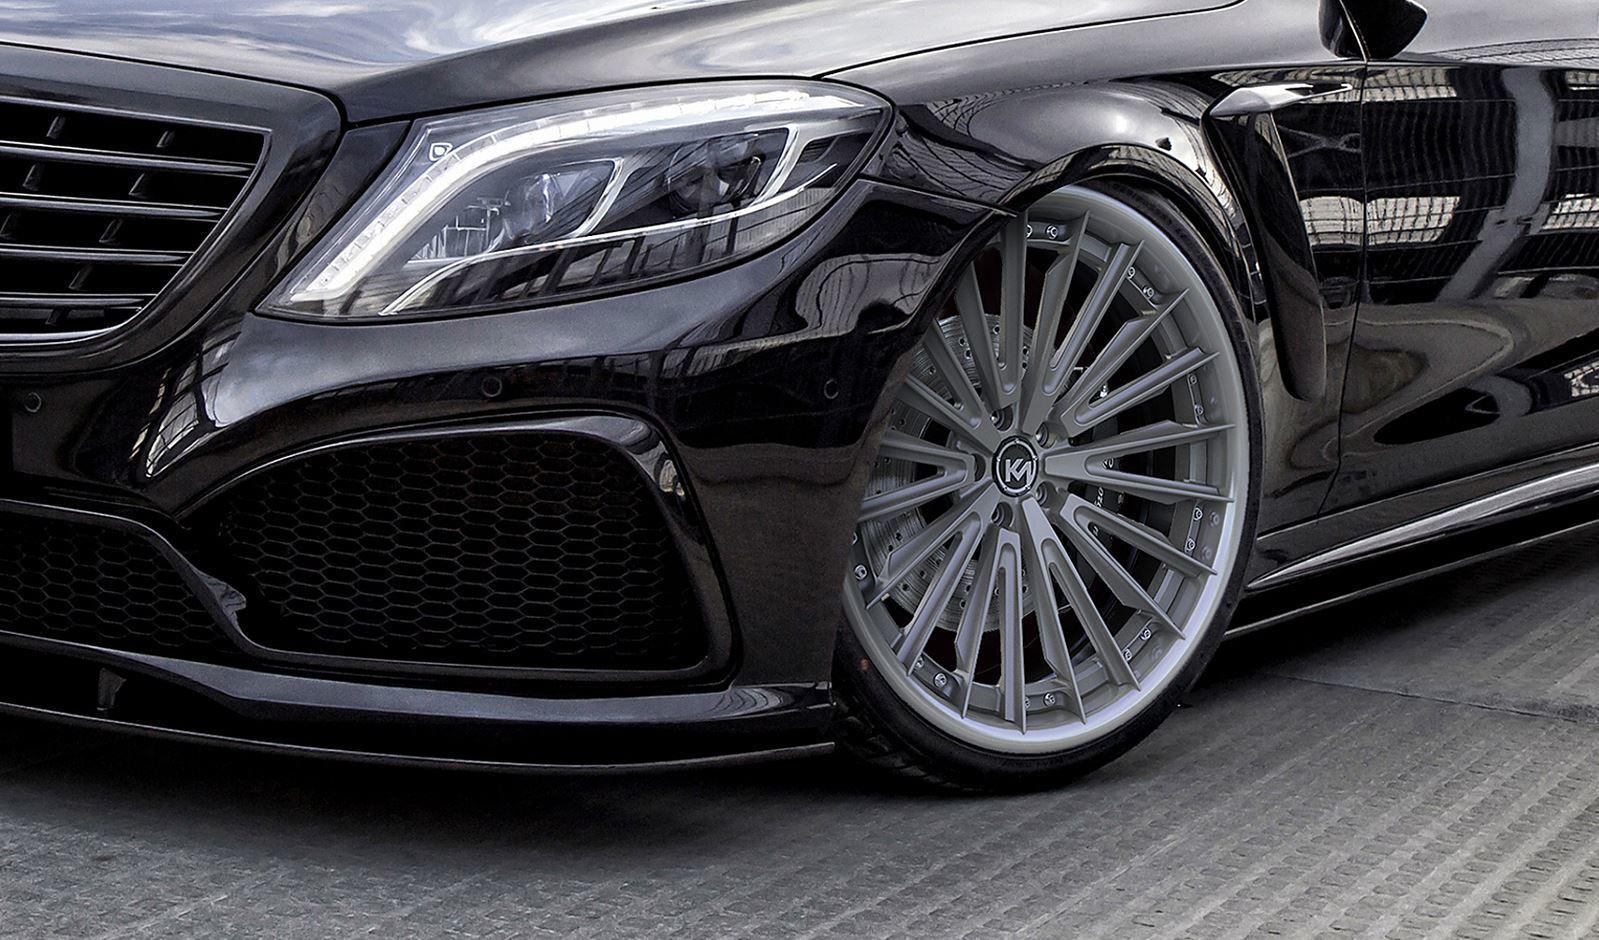 Km Forged Wheels K10.2/B